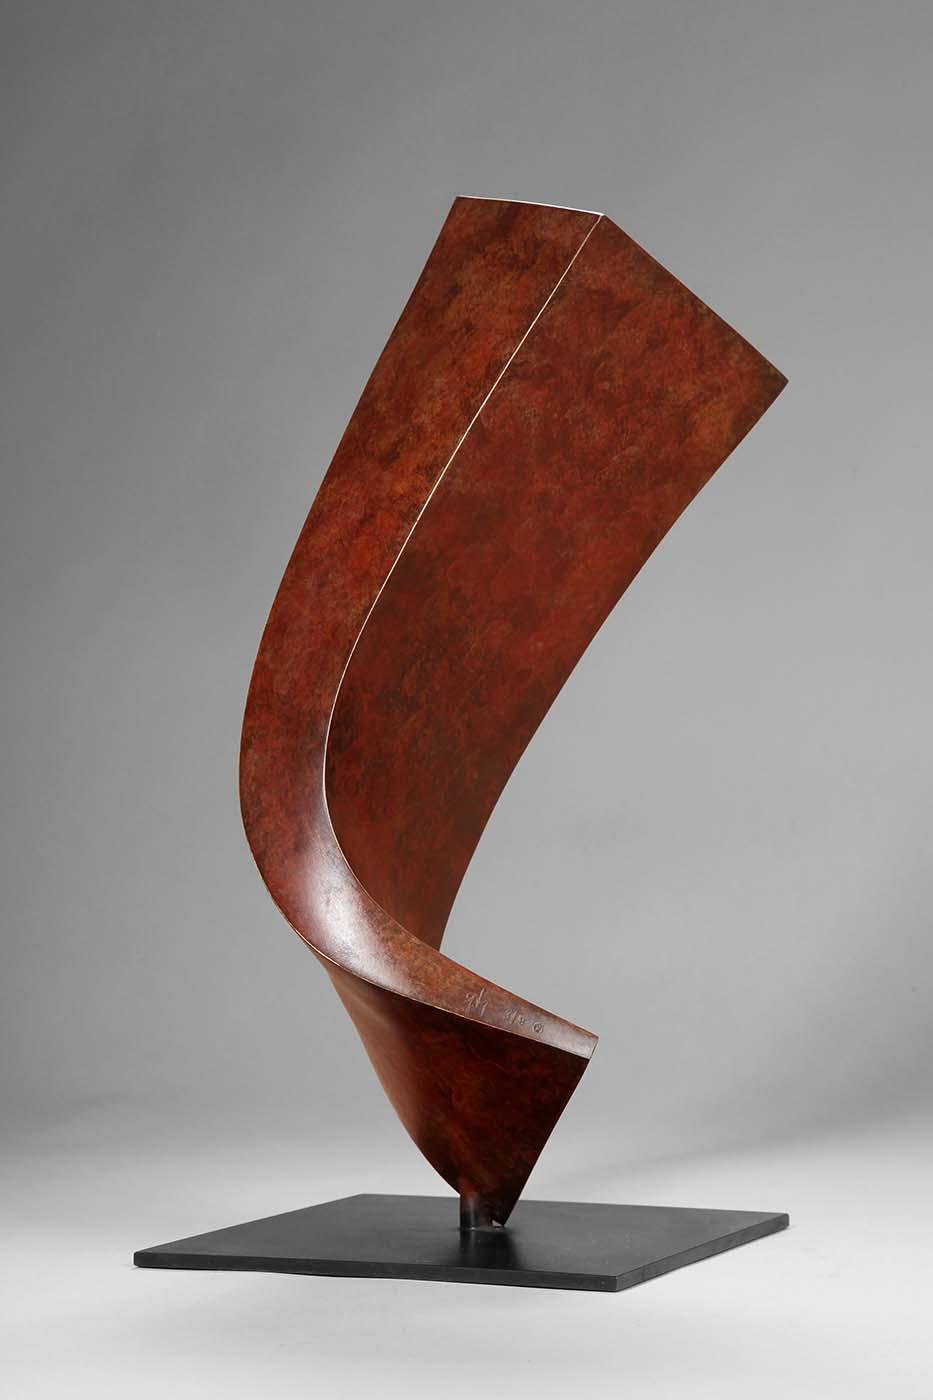 Wachstum, 2011, Bronze, 38 x 18 x 18 cm (01)